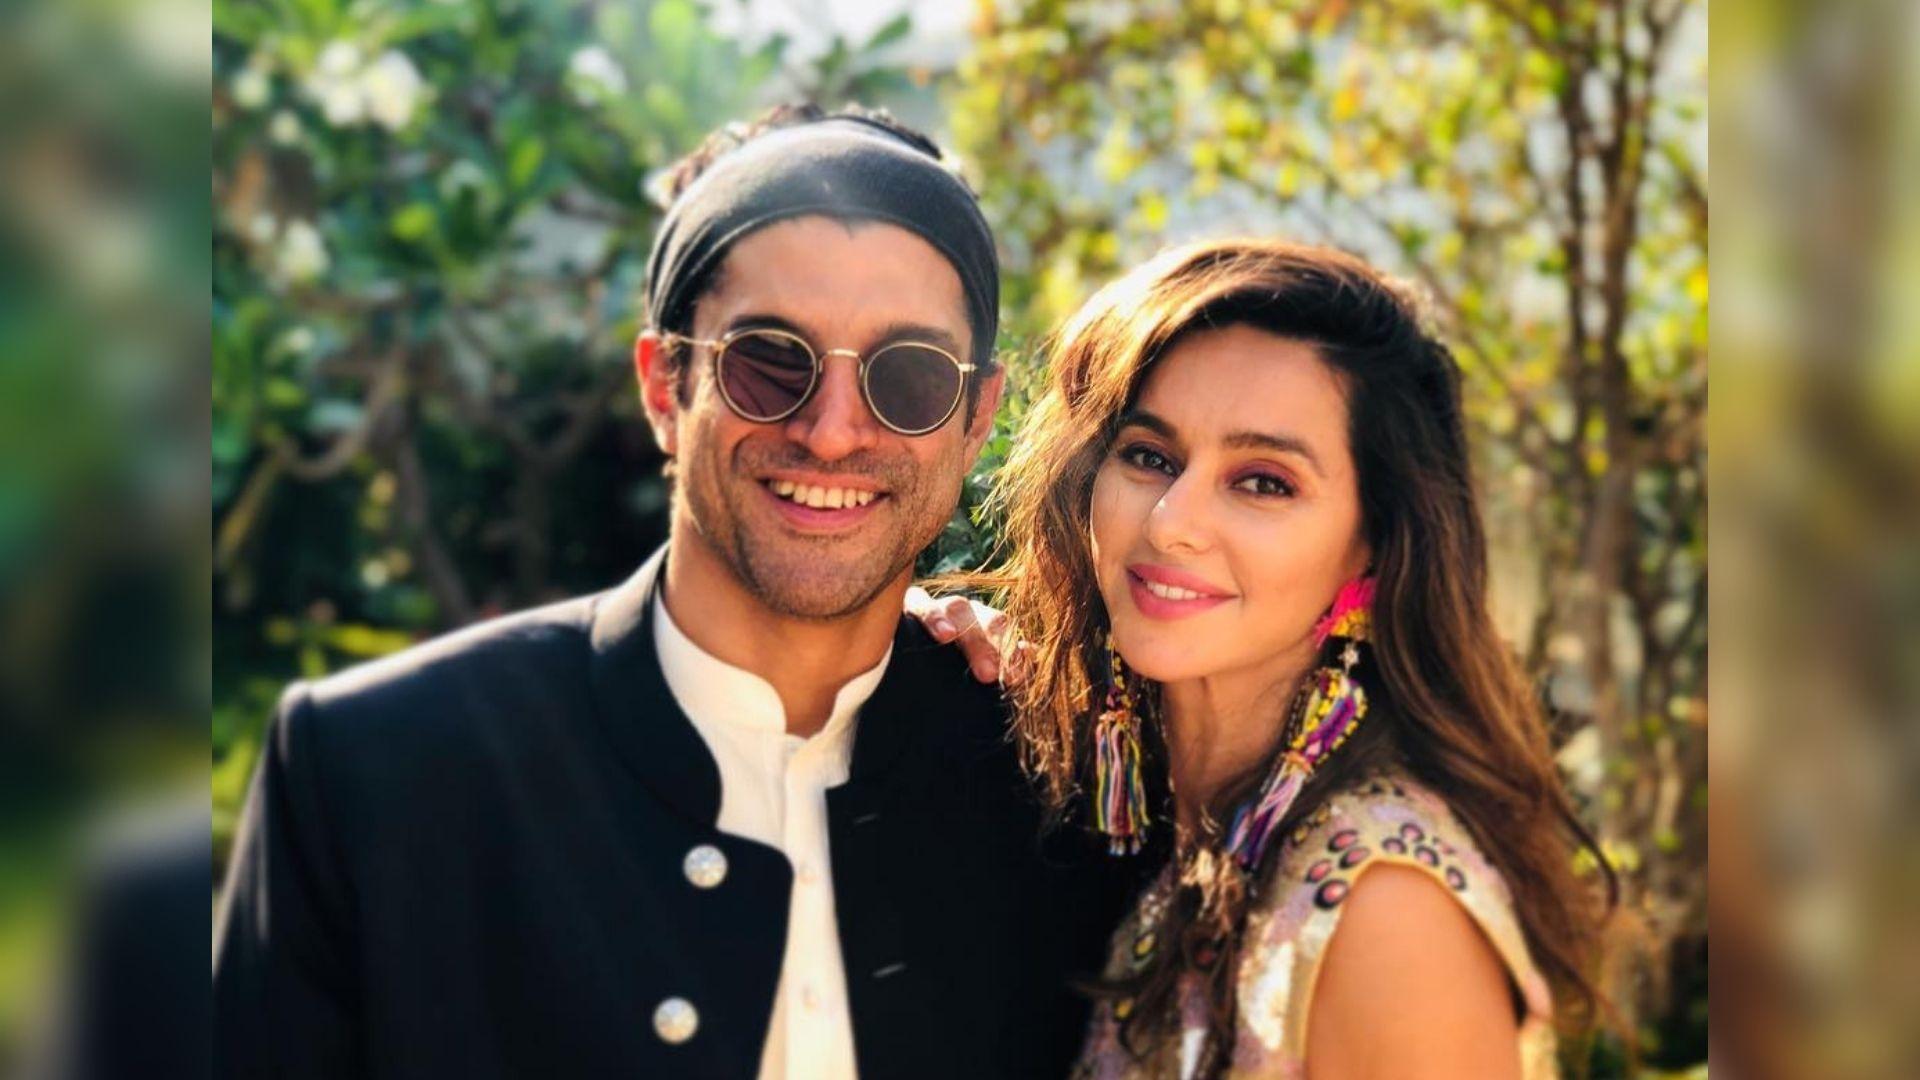 Farhan Akhtar Wishes 'Sunshine' Shibani Dandekar a Happy Birthday